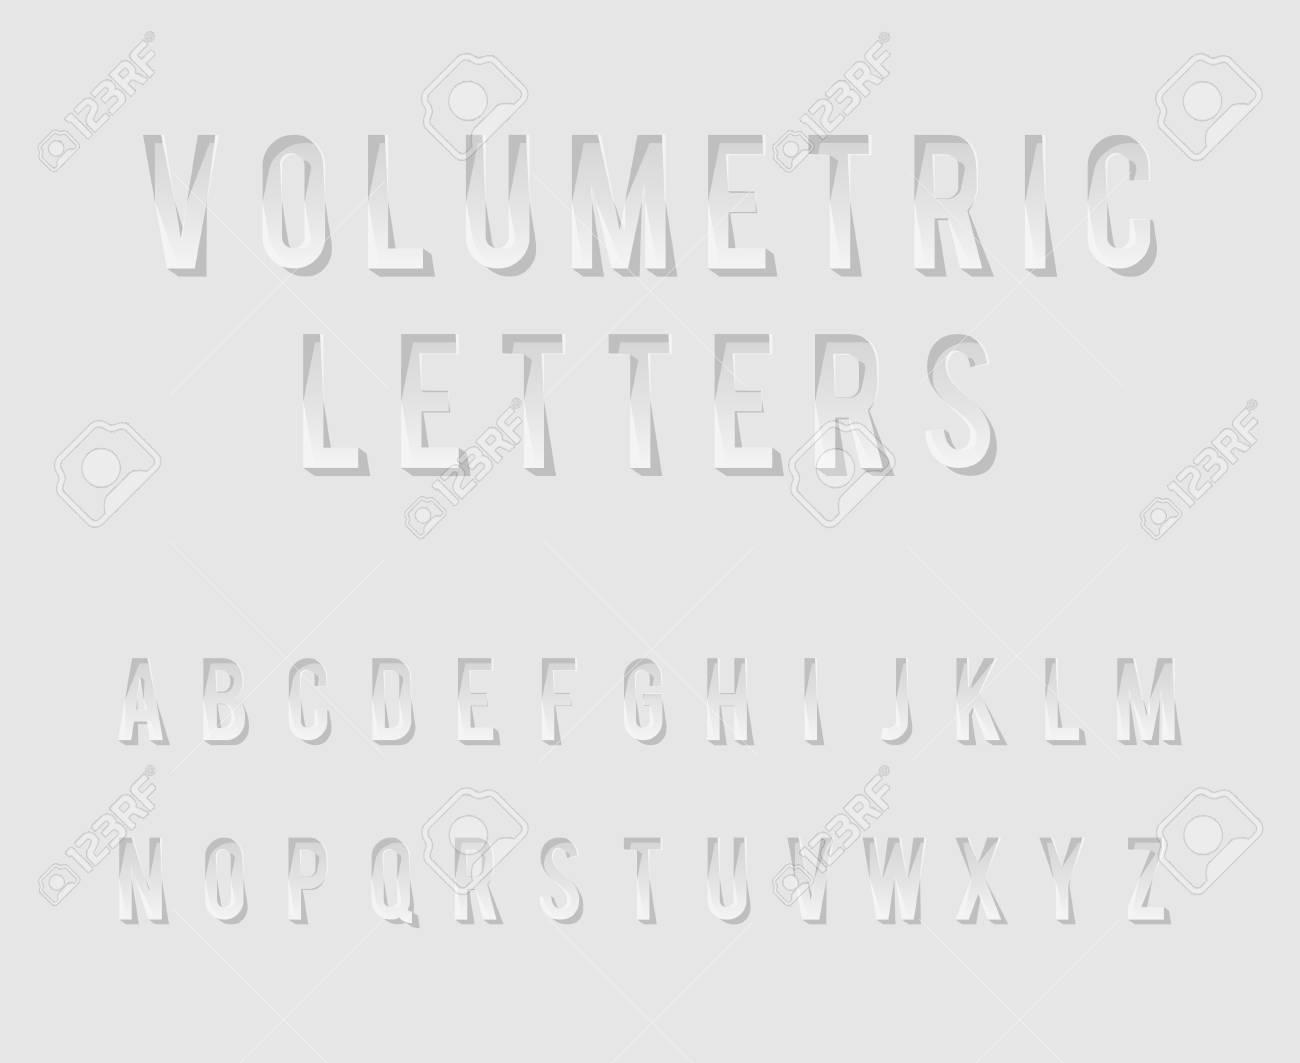 Enchanting D Alphabet Letters Template Model Certificate Resume - 3d letters template